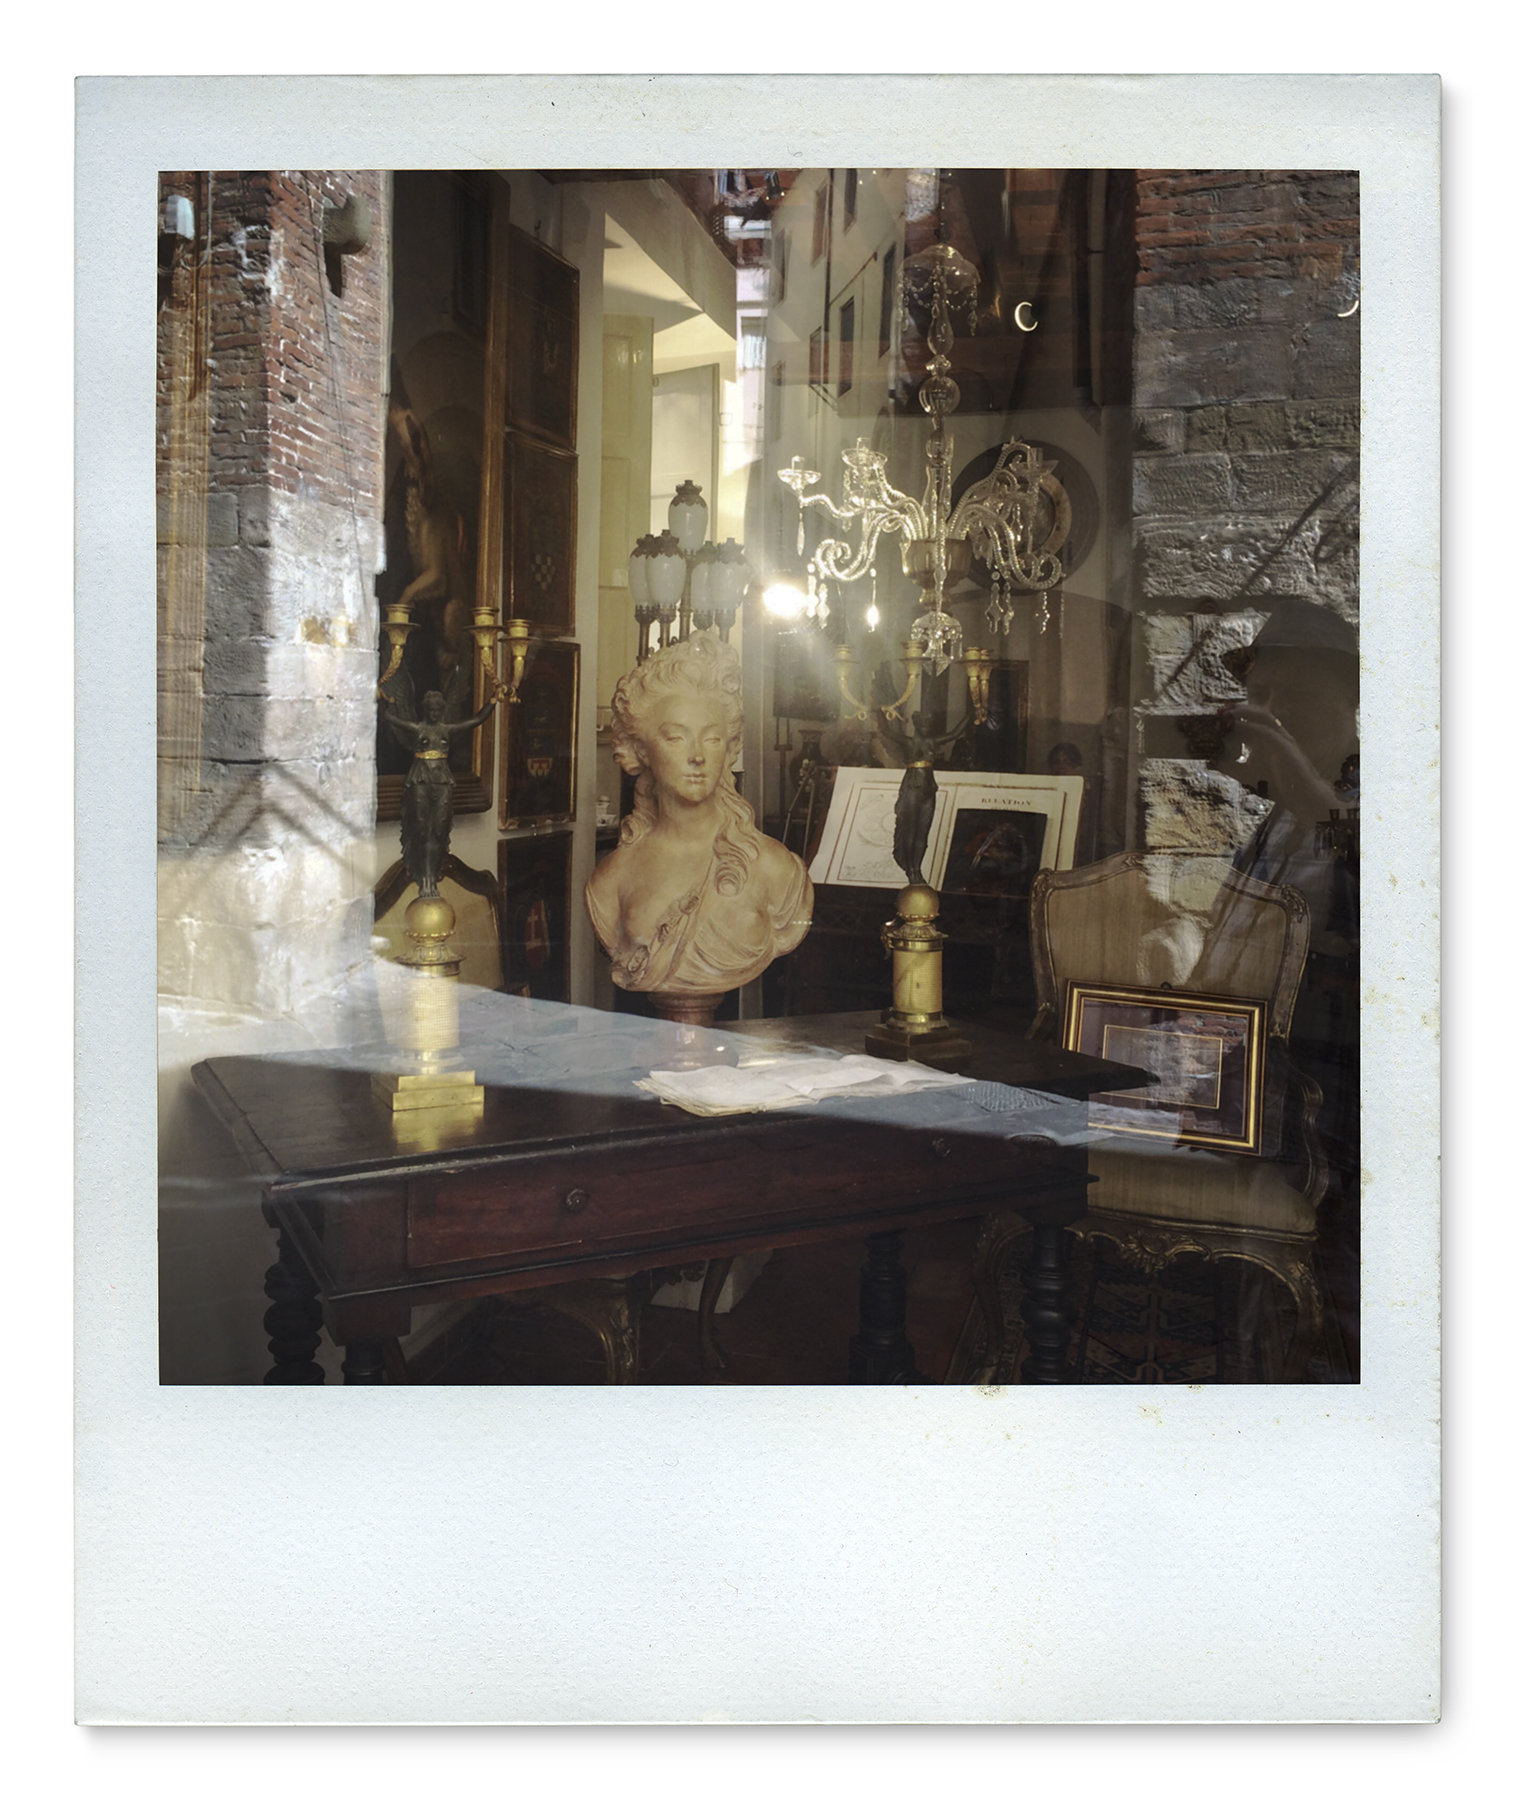 012_Polaroid SX70_IMG_2844.jpg